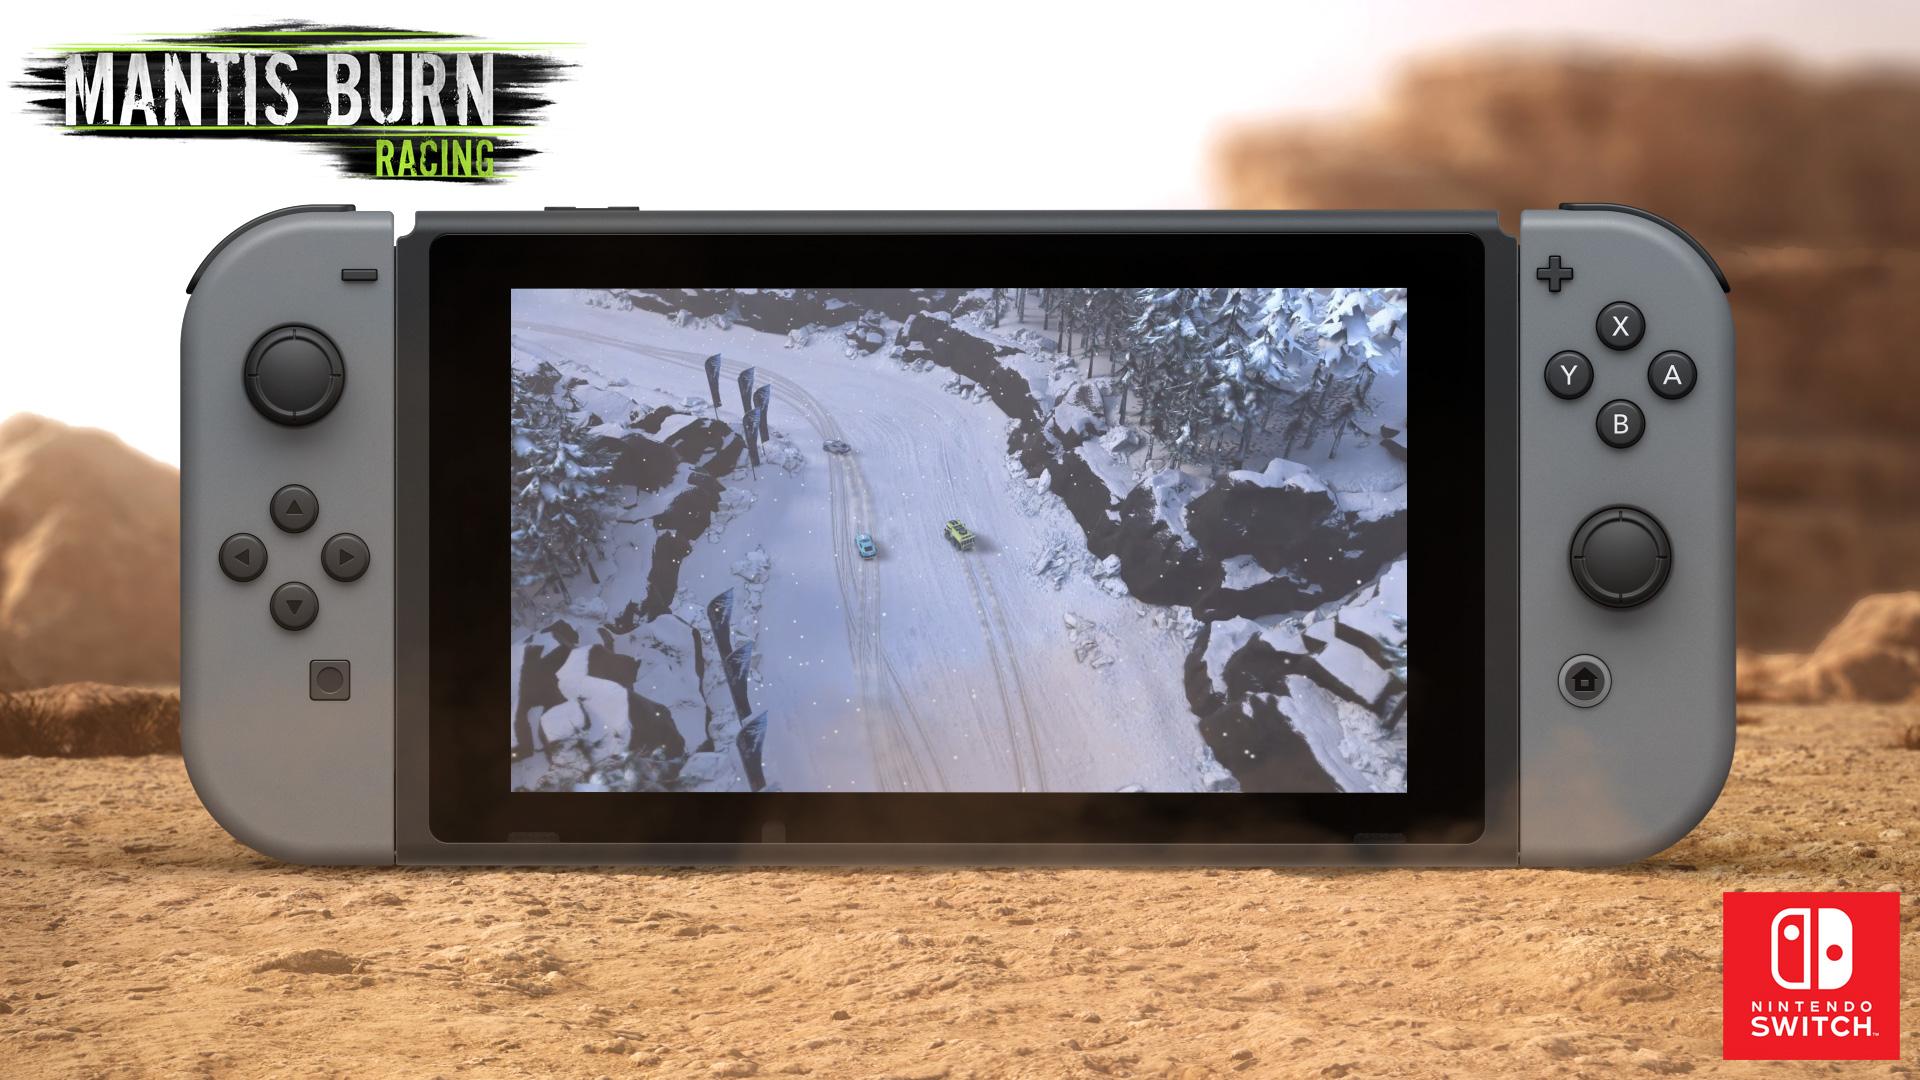 Top-down racer Mantis Burn Racing is coming to Nintendo Switch